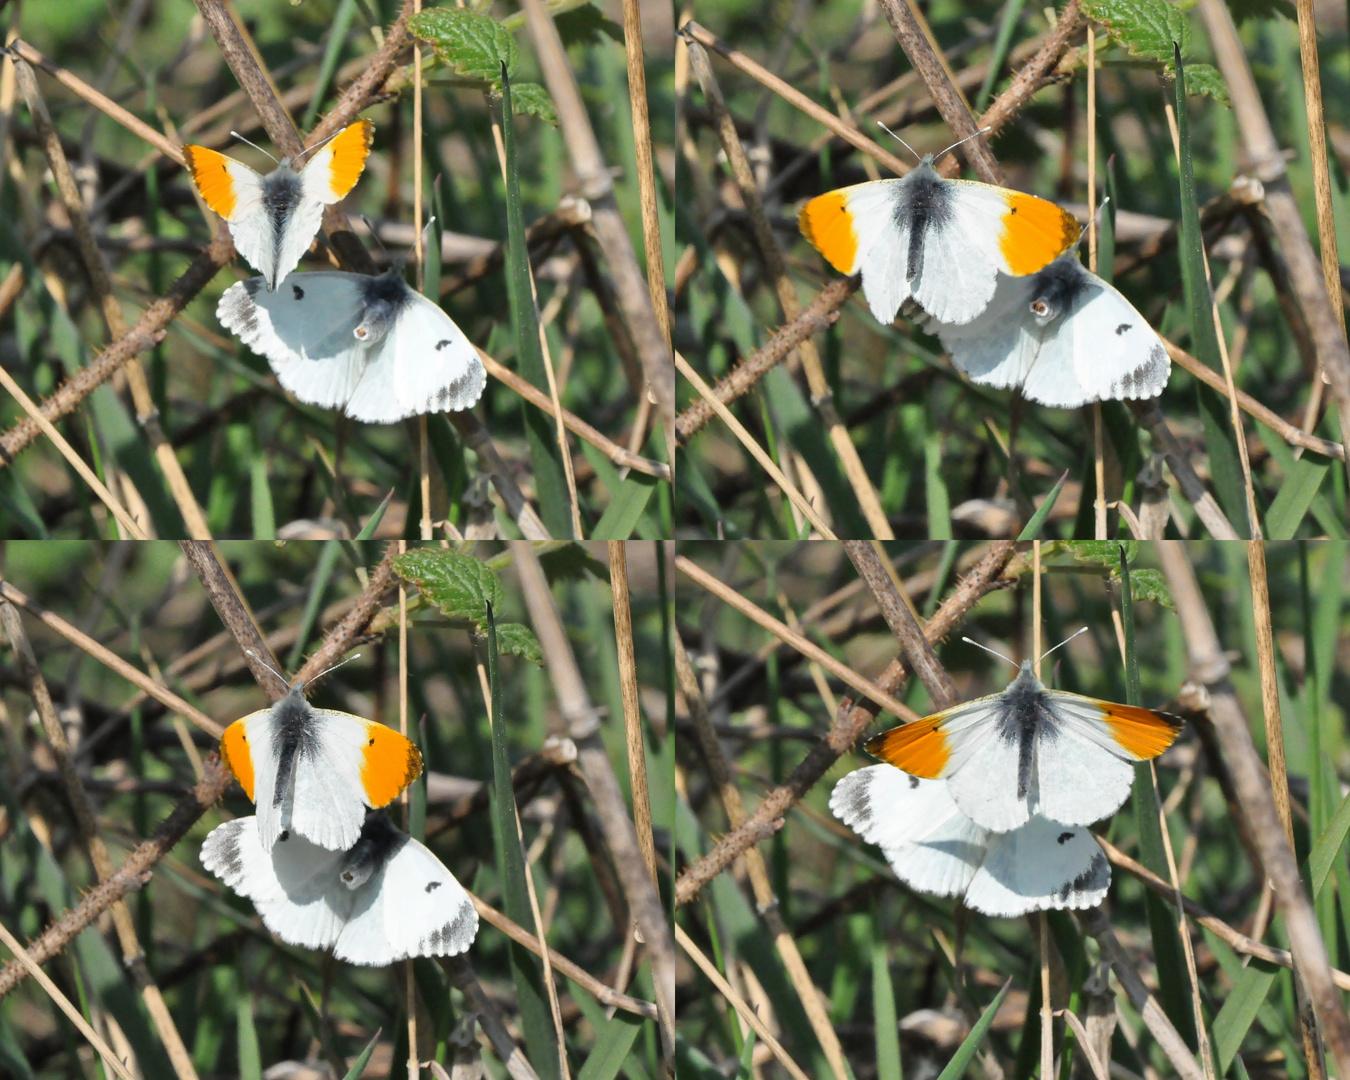 Insekten-Paarung 19: Schmetterlinge